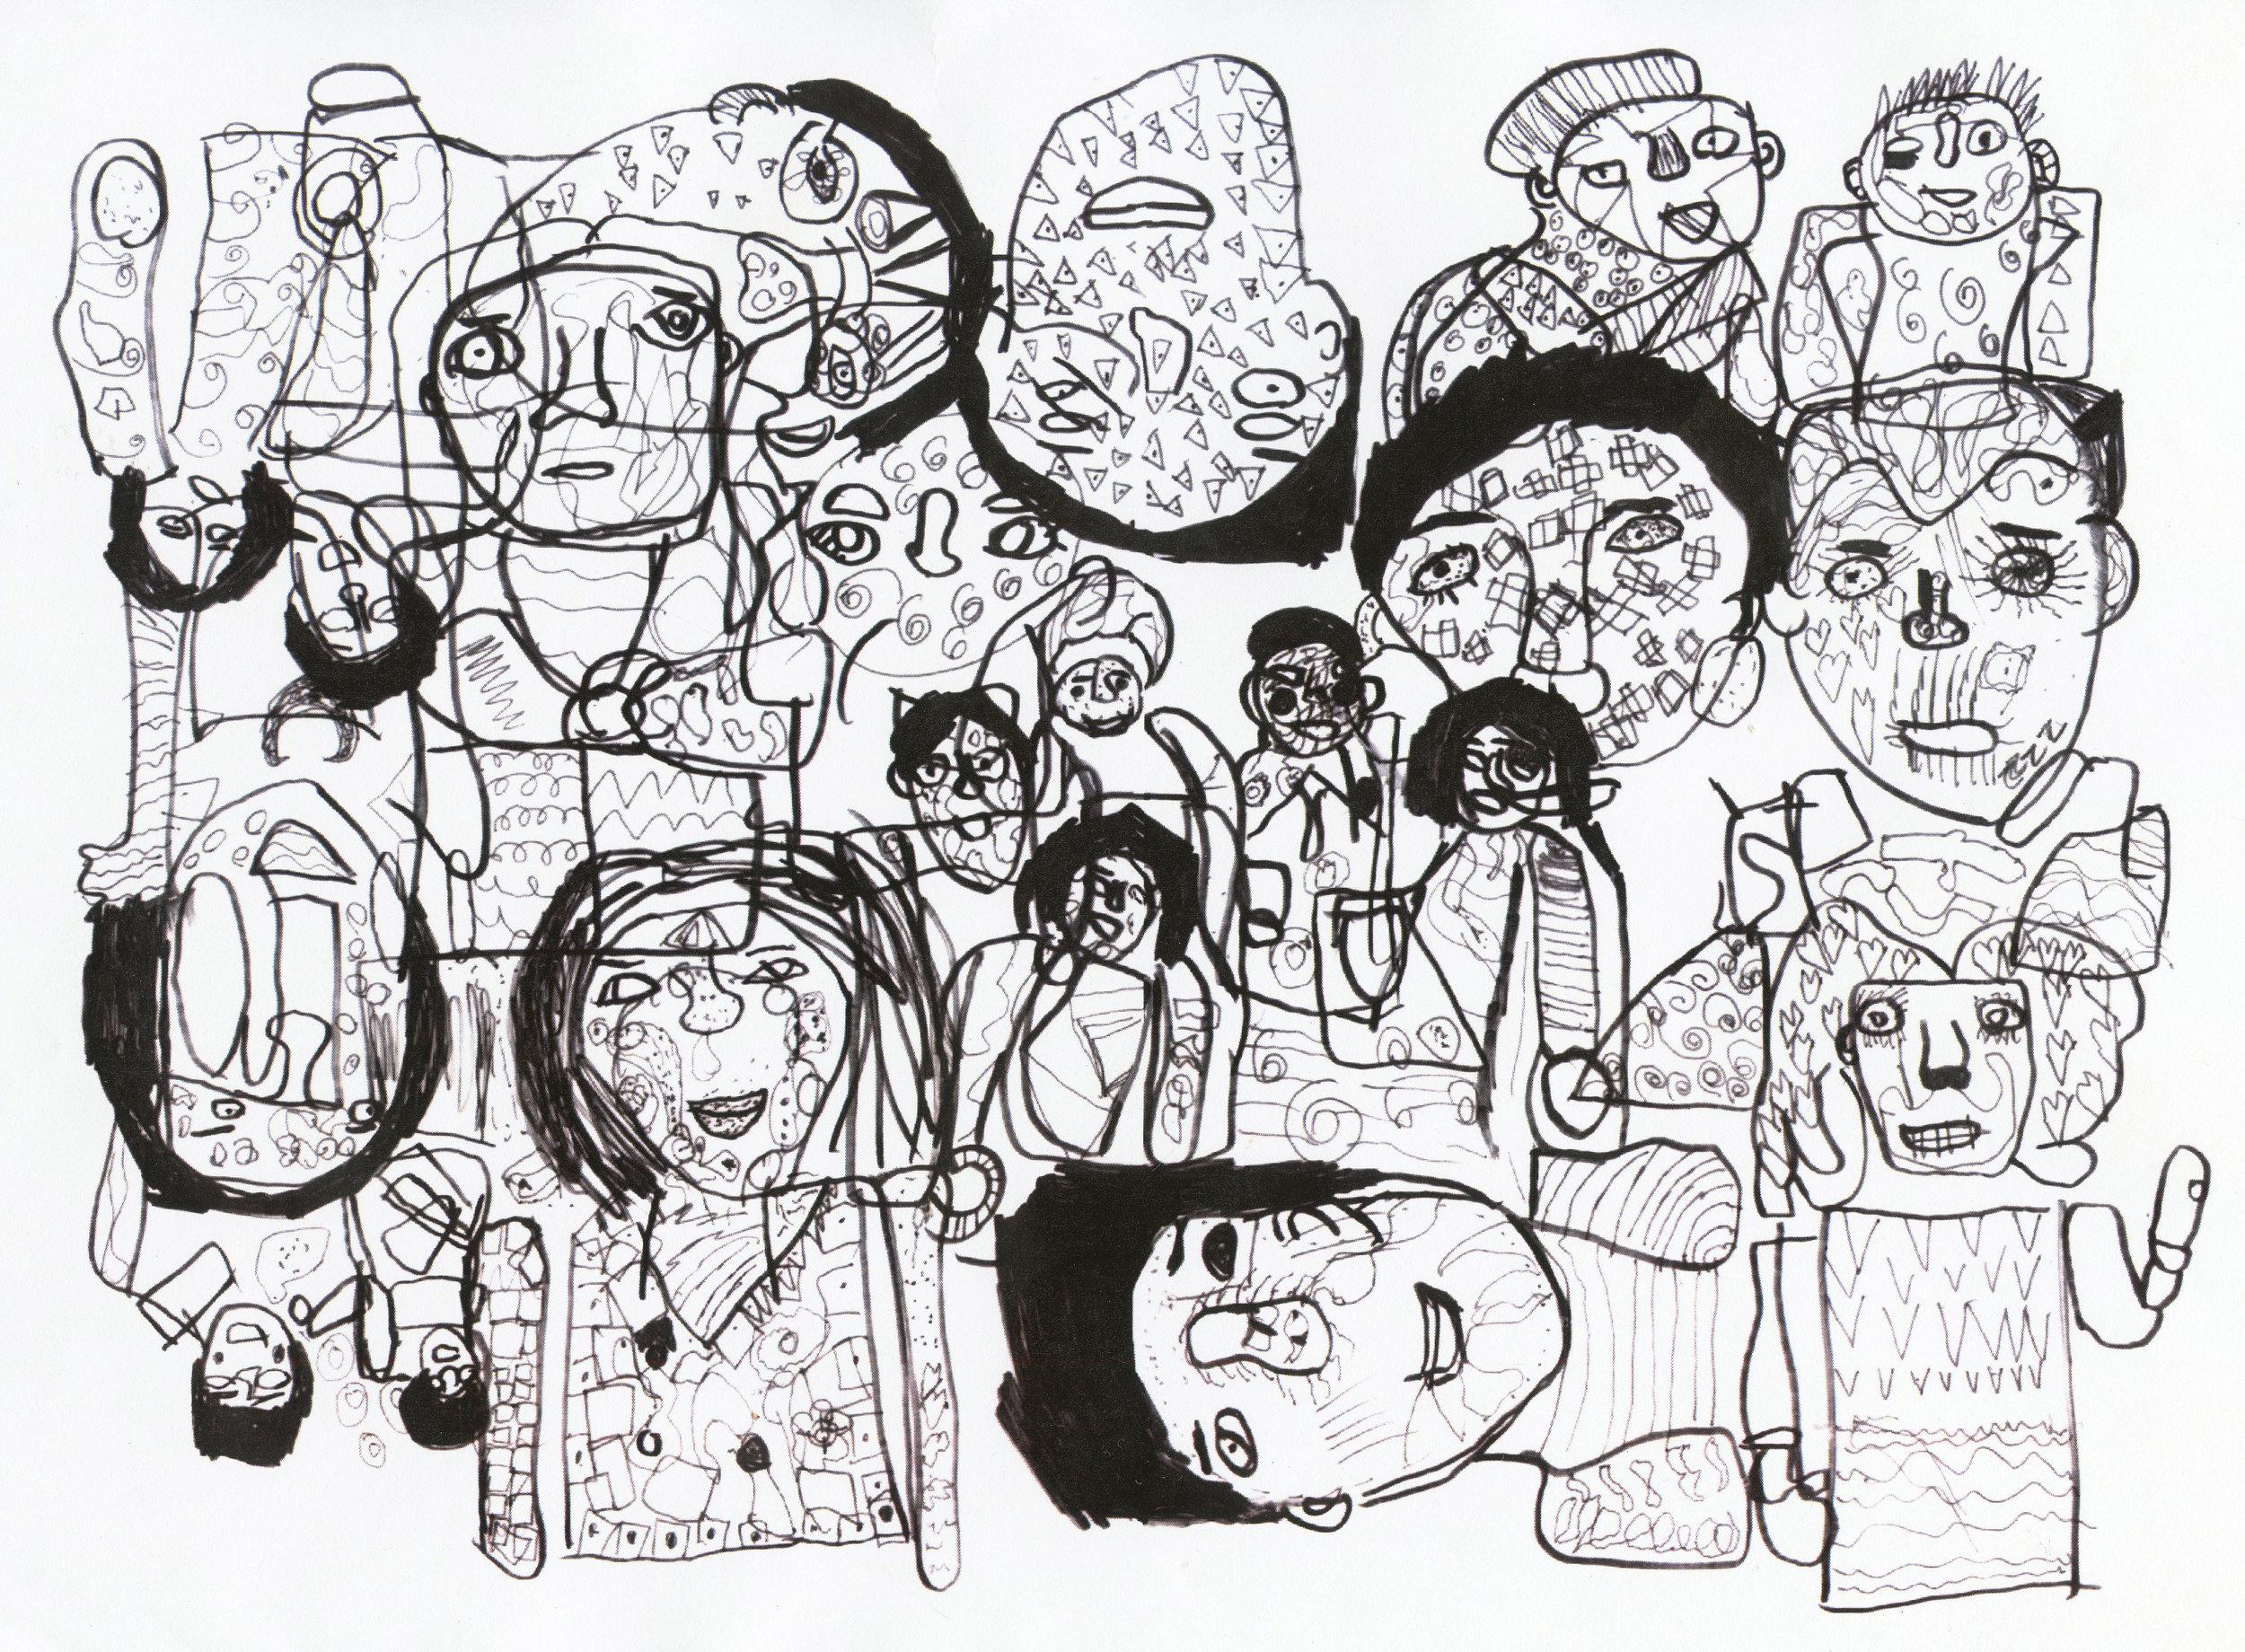 Image: 'Coronation Street Weddings' ink on paper by Amy Ellison, 2018.